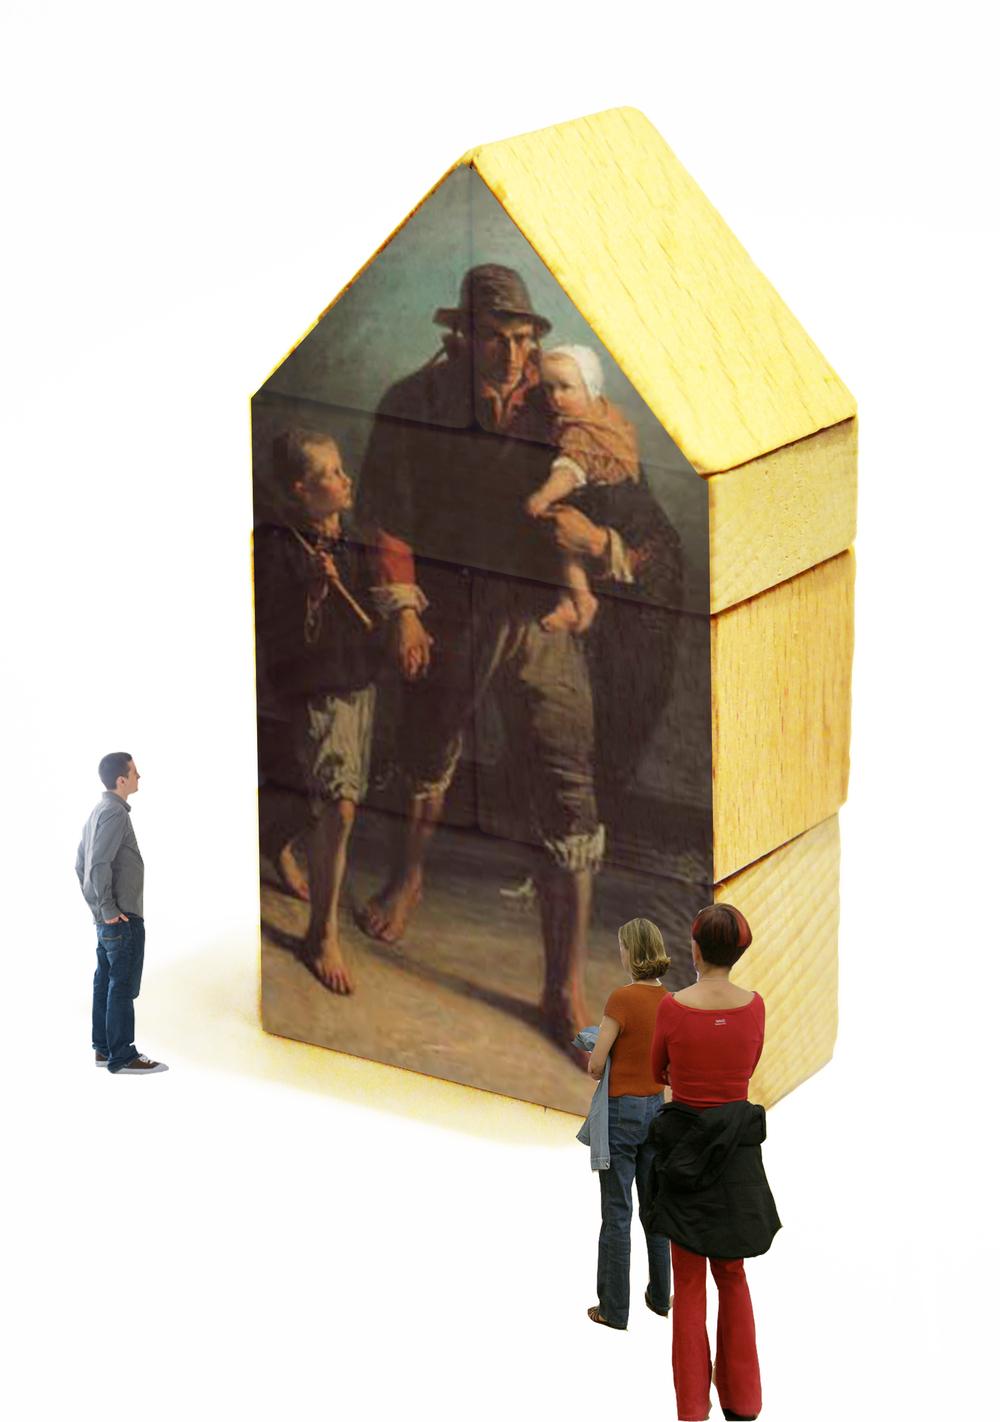 RUG400_blokkentorenJI_schilderij02.jpg